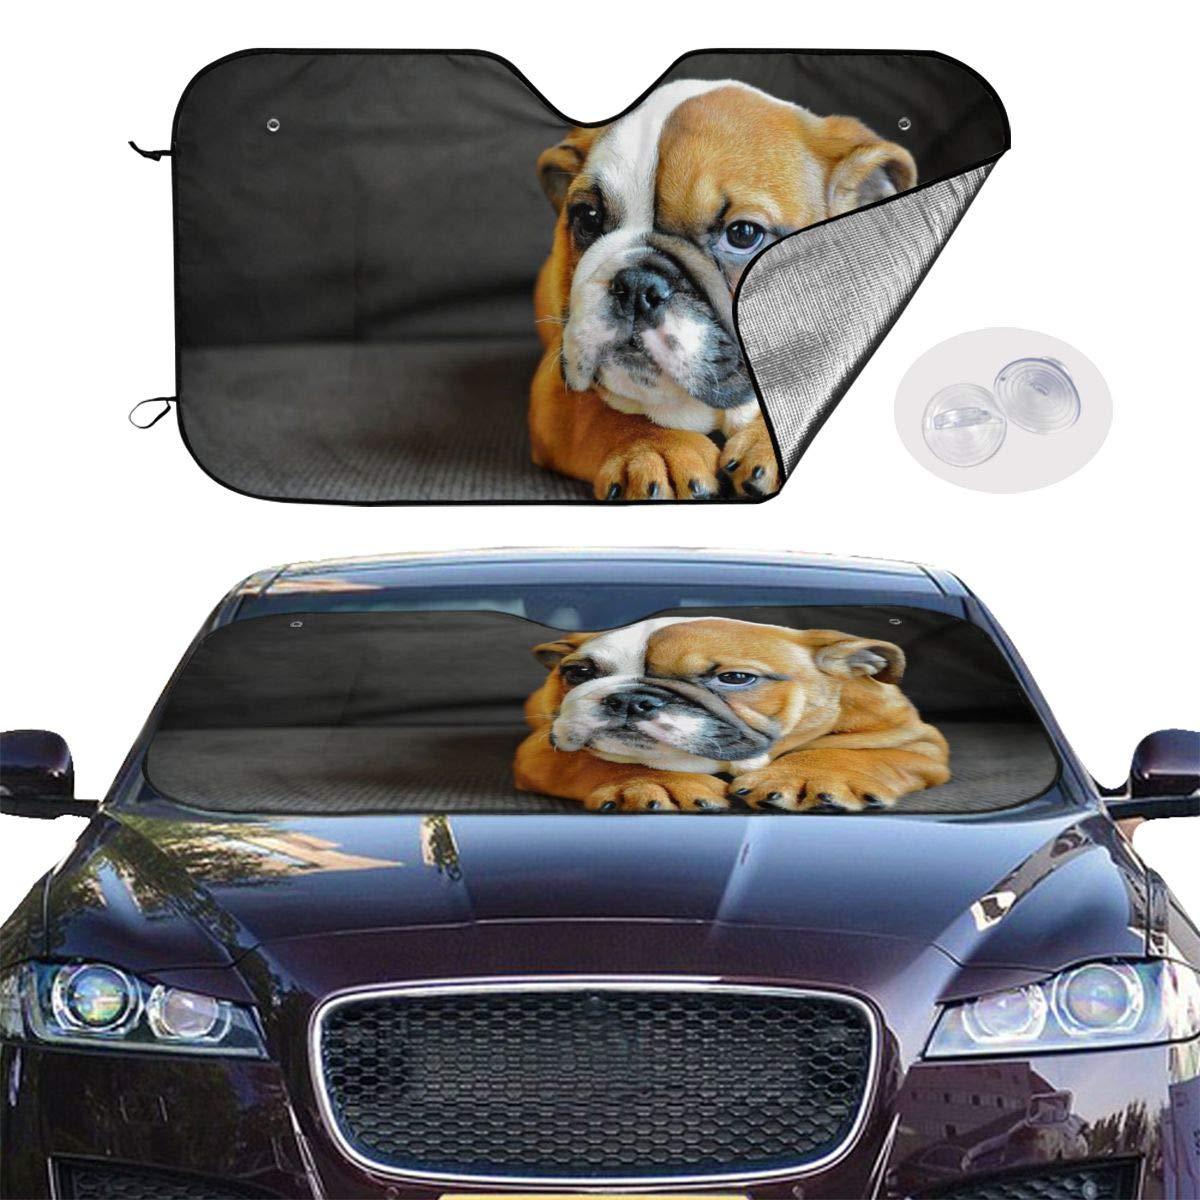 Kneeling English Bulldog Windshield Sun Shade Cover Visor Protector Sunshades Covers Awning Shades Uv Reflector for Car SUV Truck Universal